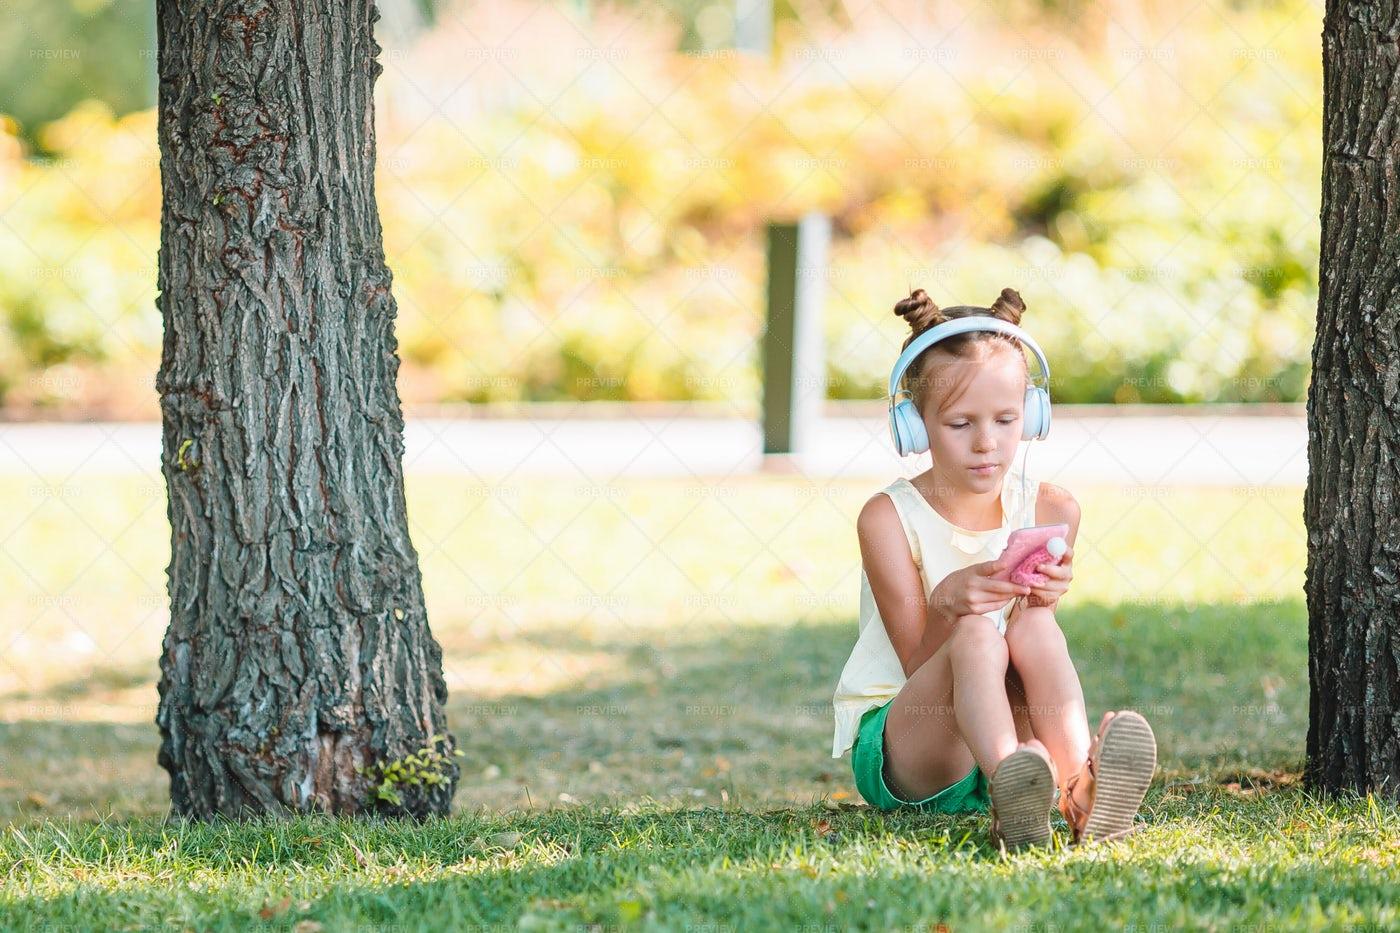 Girl Listening To Music: Stock Photos